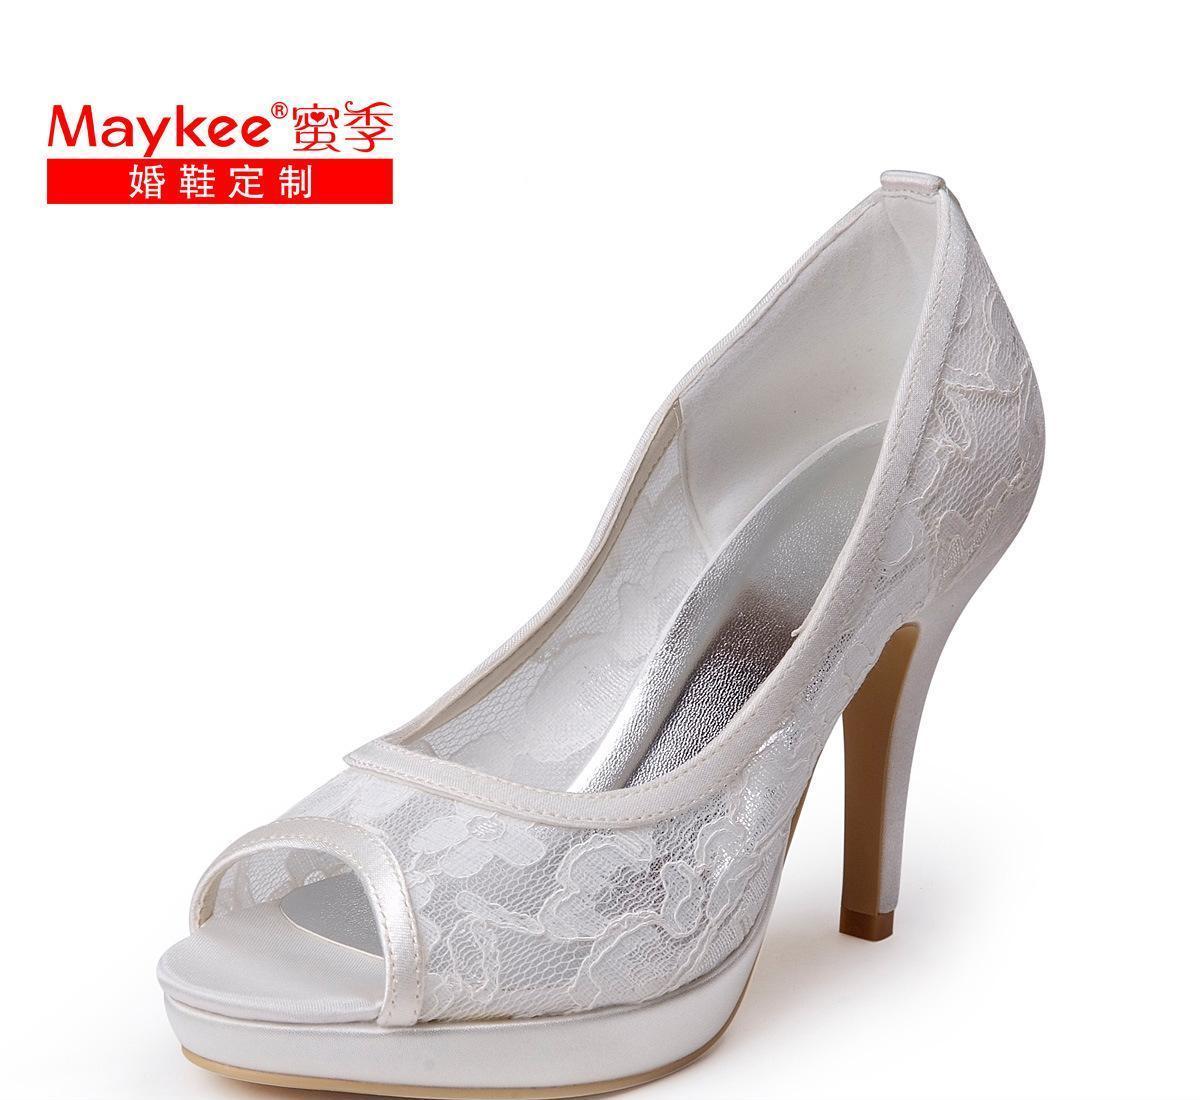 Maykee 蜜季初秋新品蕾丝高跟婚鞋晚宴鞋大码女鞋子